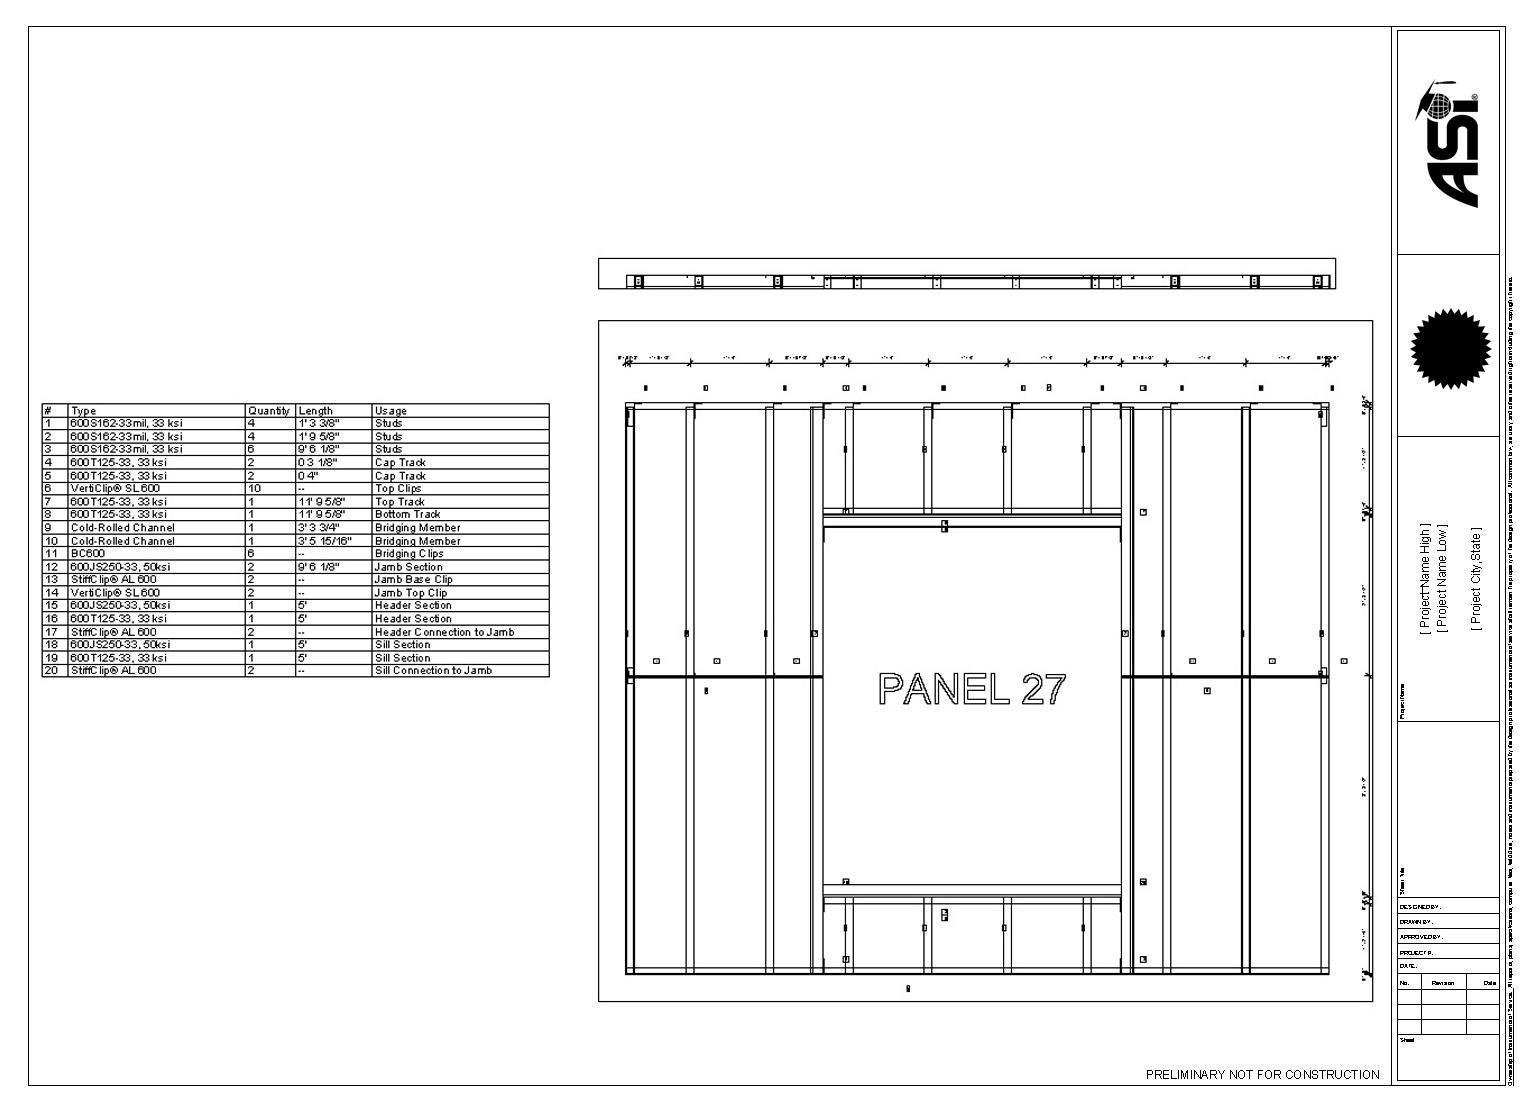 Steelsmart Framer Light Steel Framing Bim Autodesk Revit Plugin English Drawing Shear Force And Bending Moment Diagrams Youtube Panel With Cut List